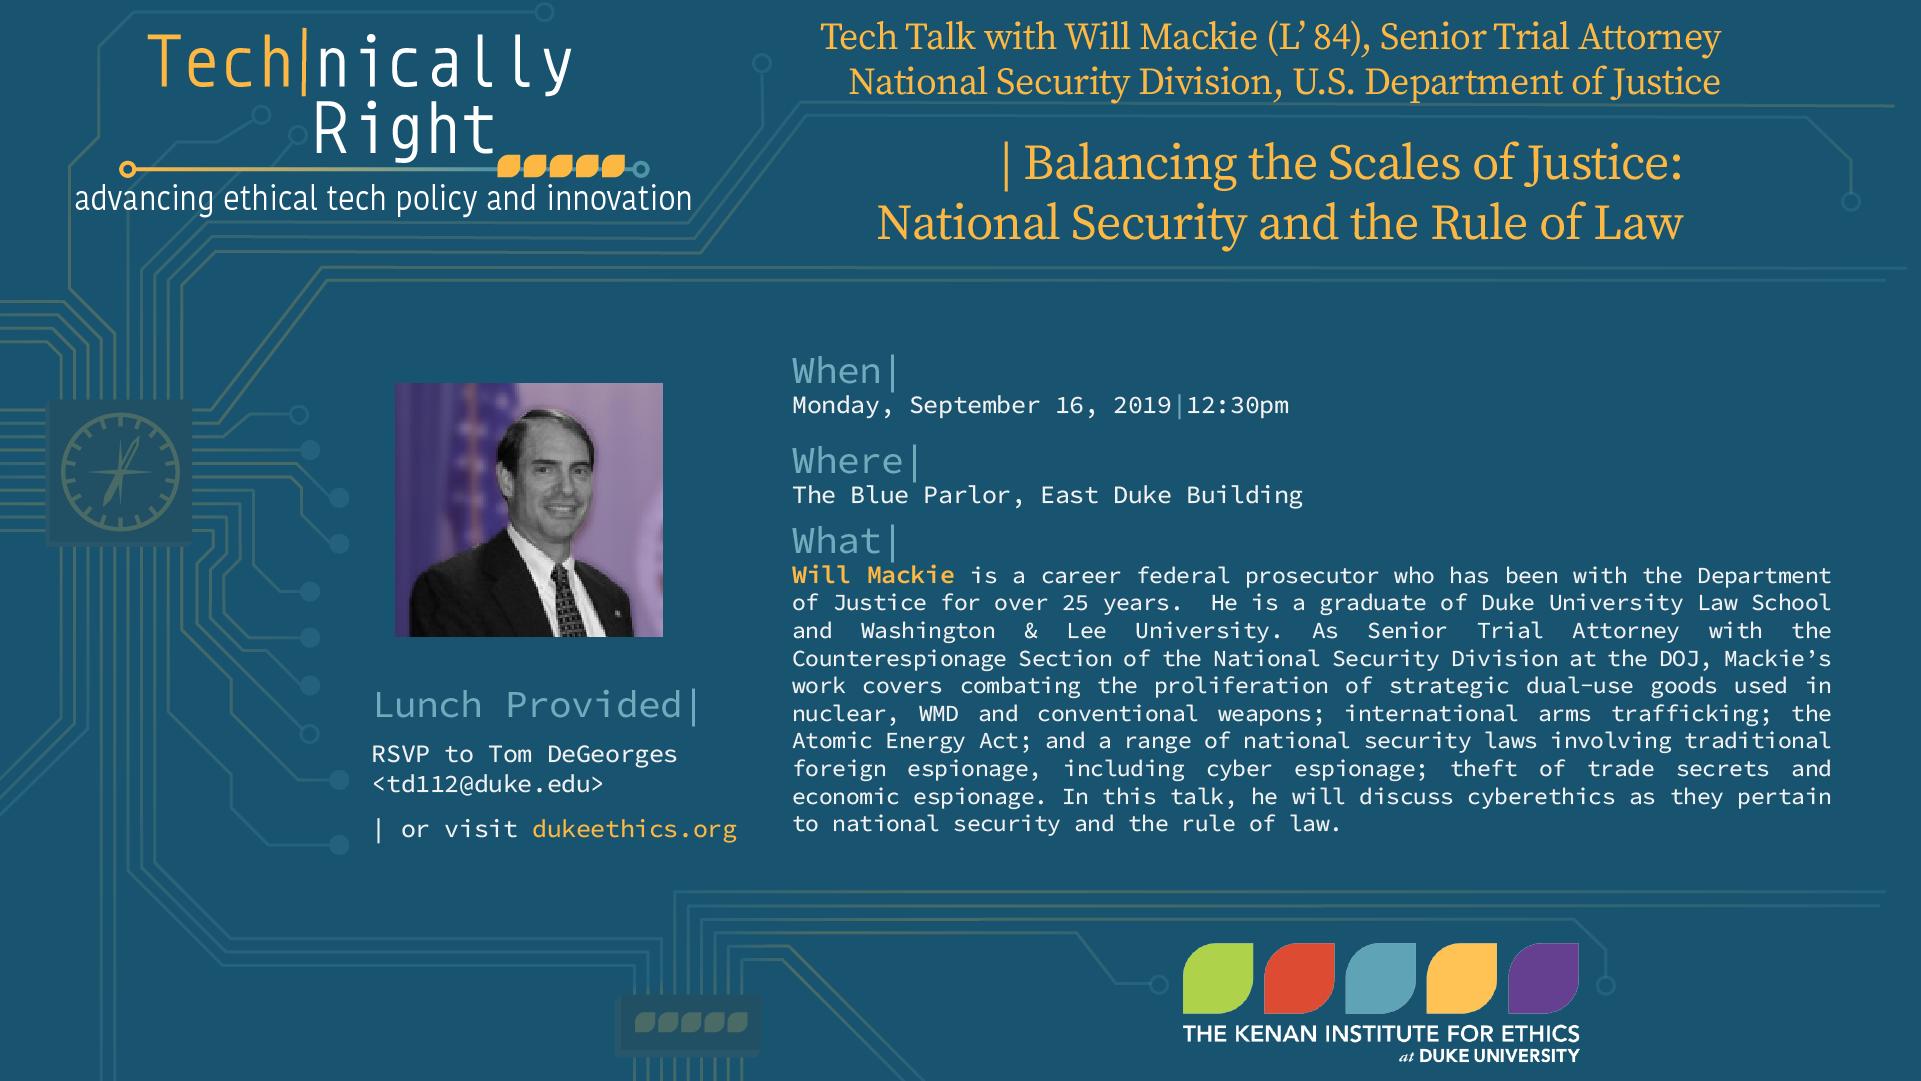 TechTalk - _Will Mackie